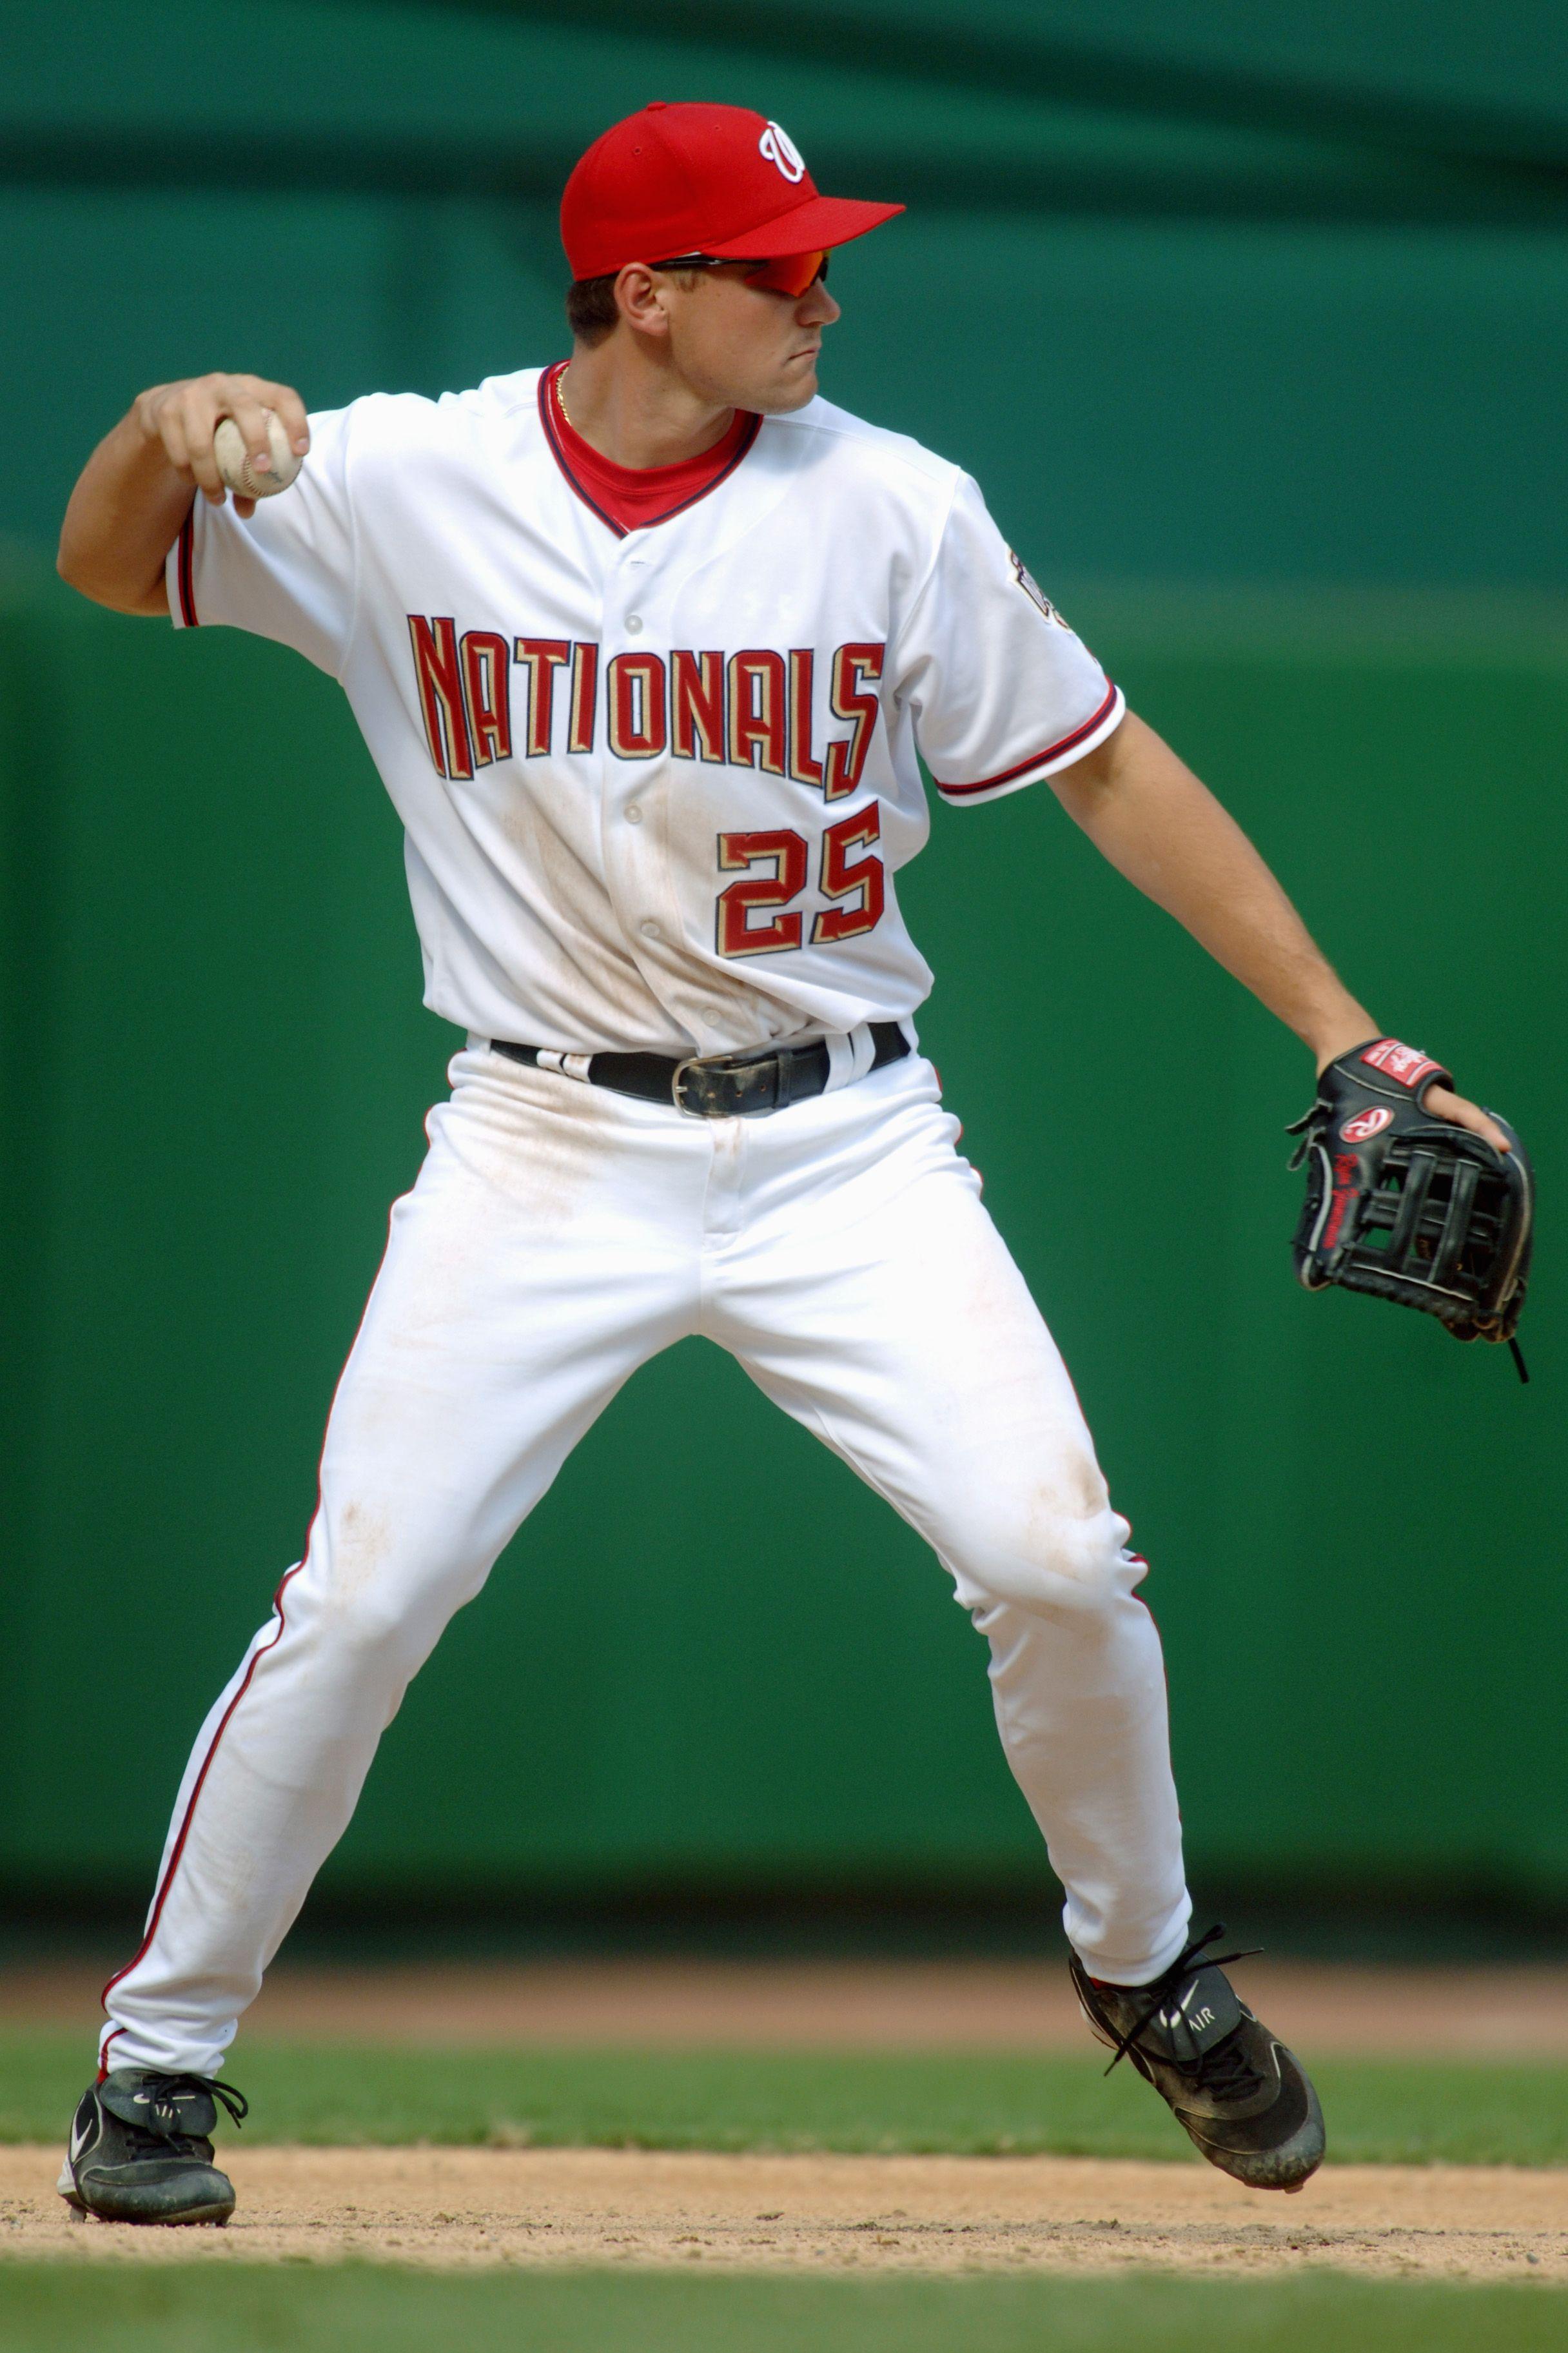 b0e1561668323 Best and Worst Baseball Uniforms - History's Best and Worst Baseball ...